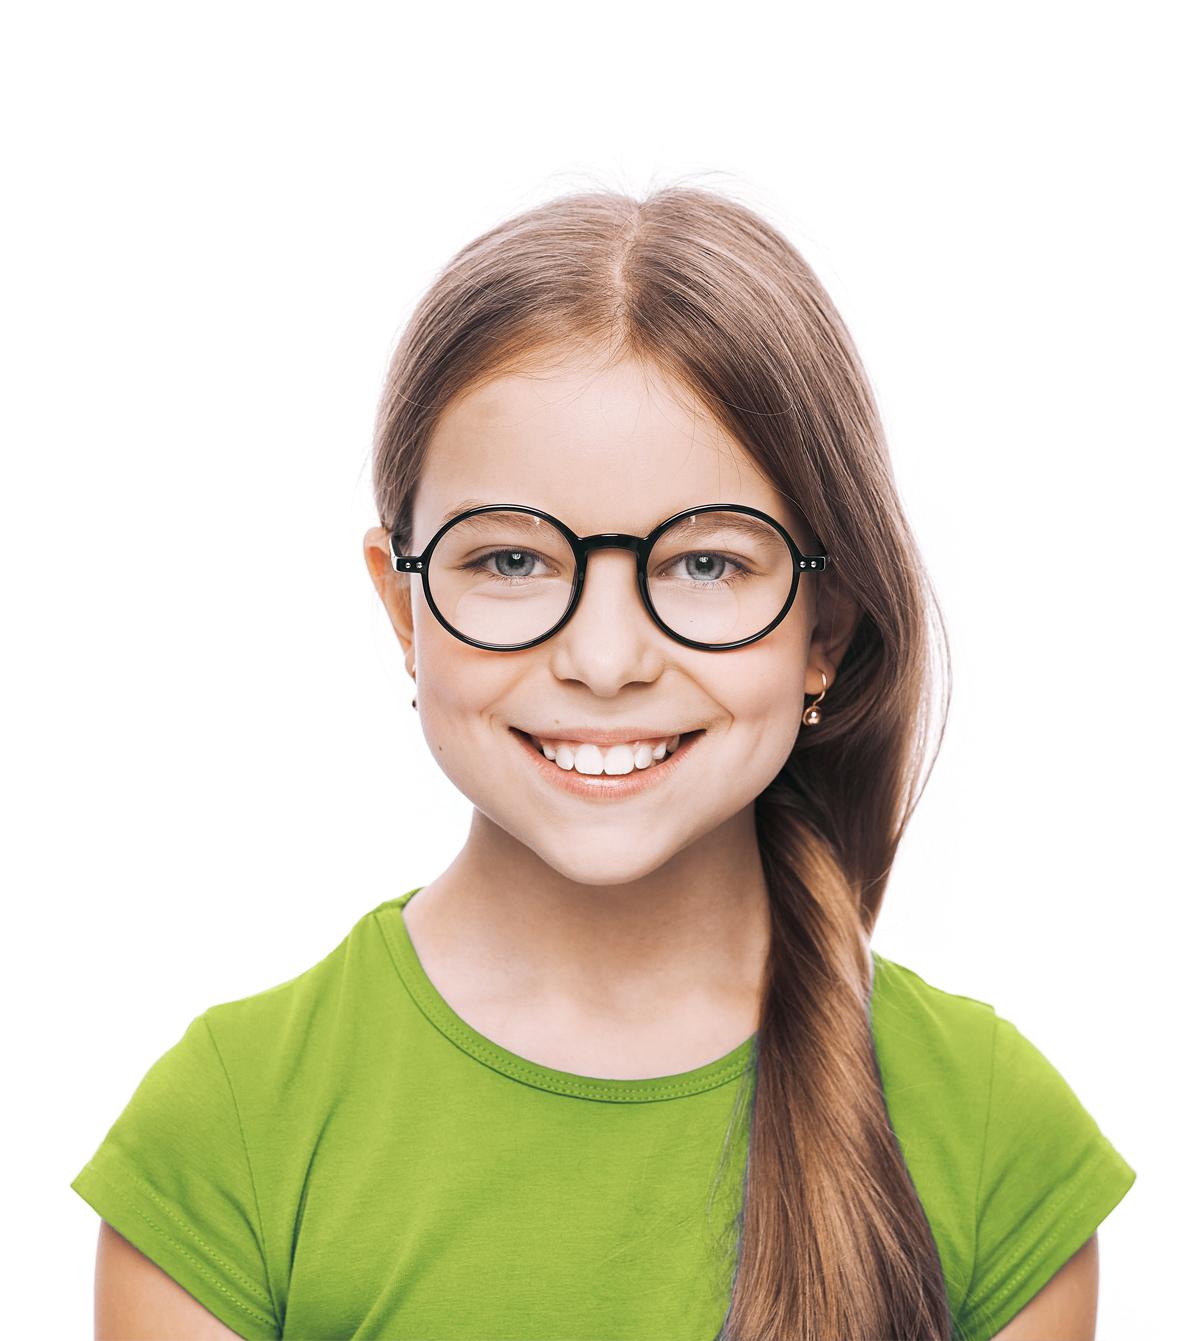 vpr-primair-onderwijs-meisje